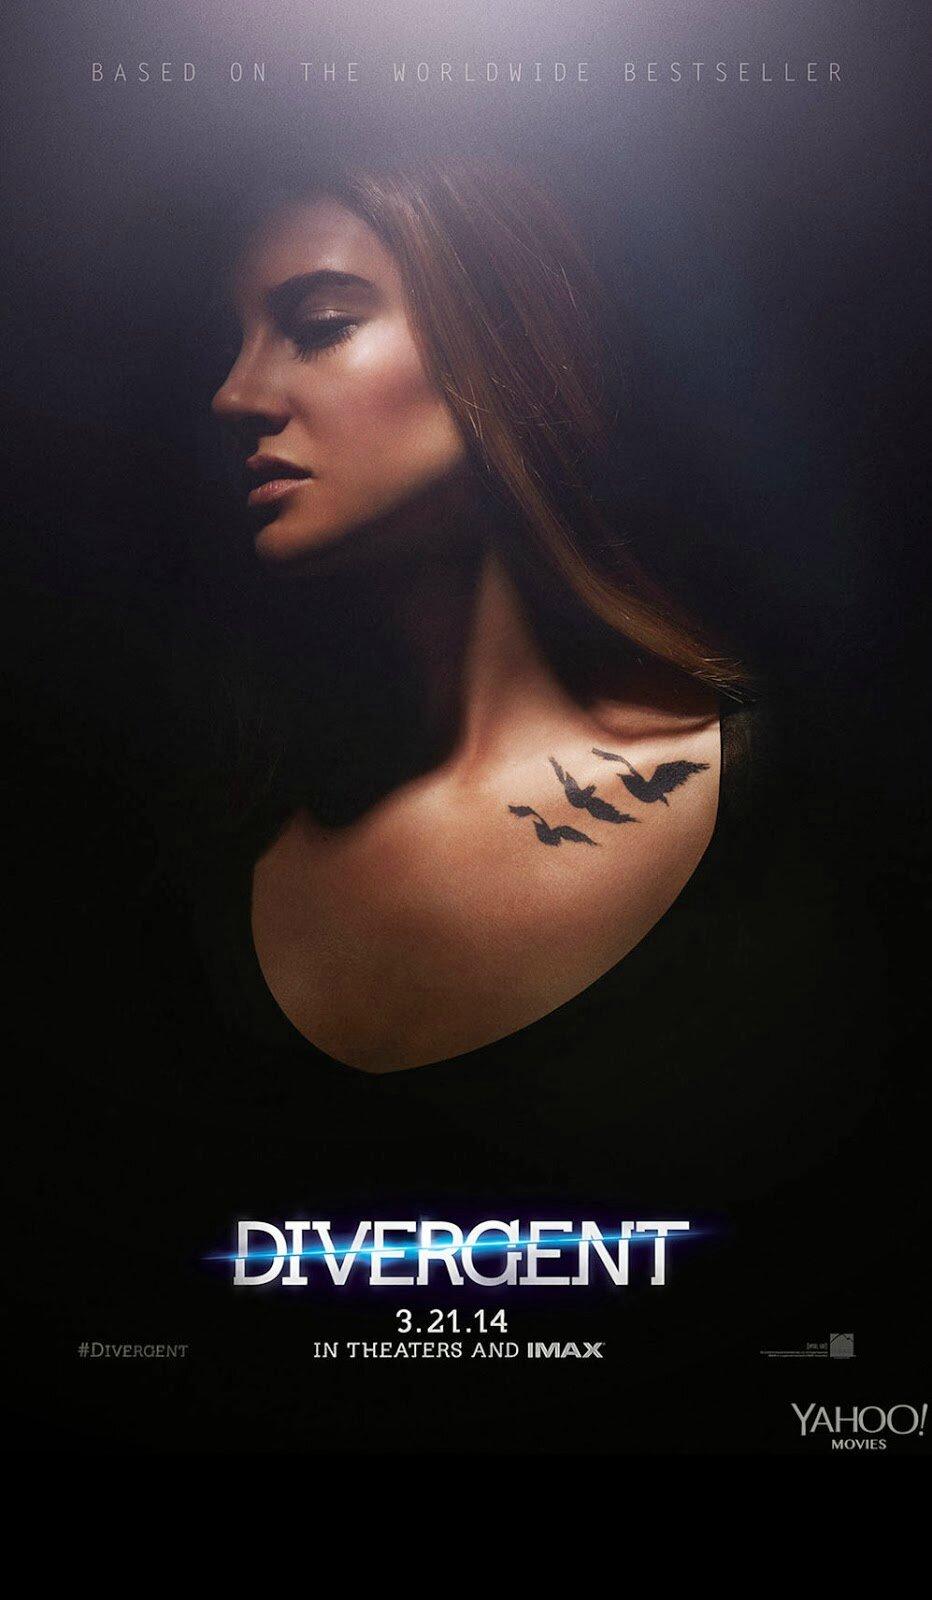 Tris poster Divergent movie